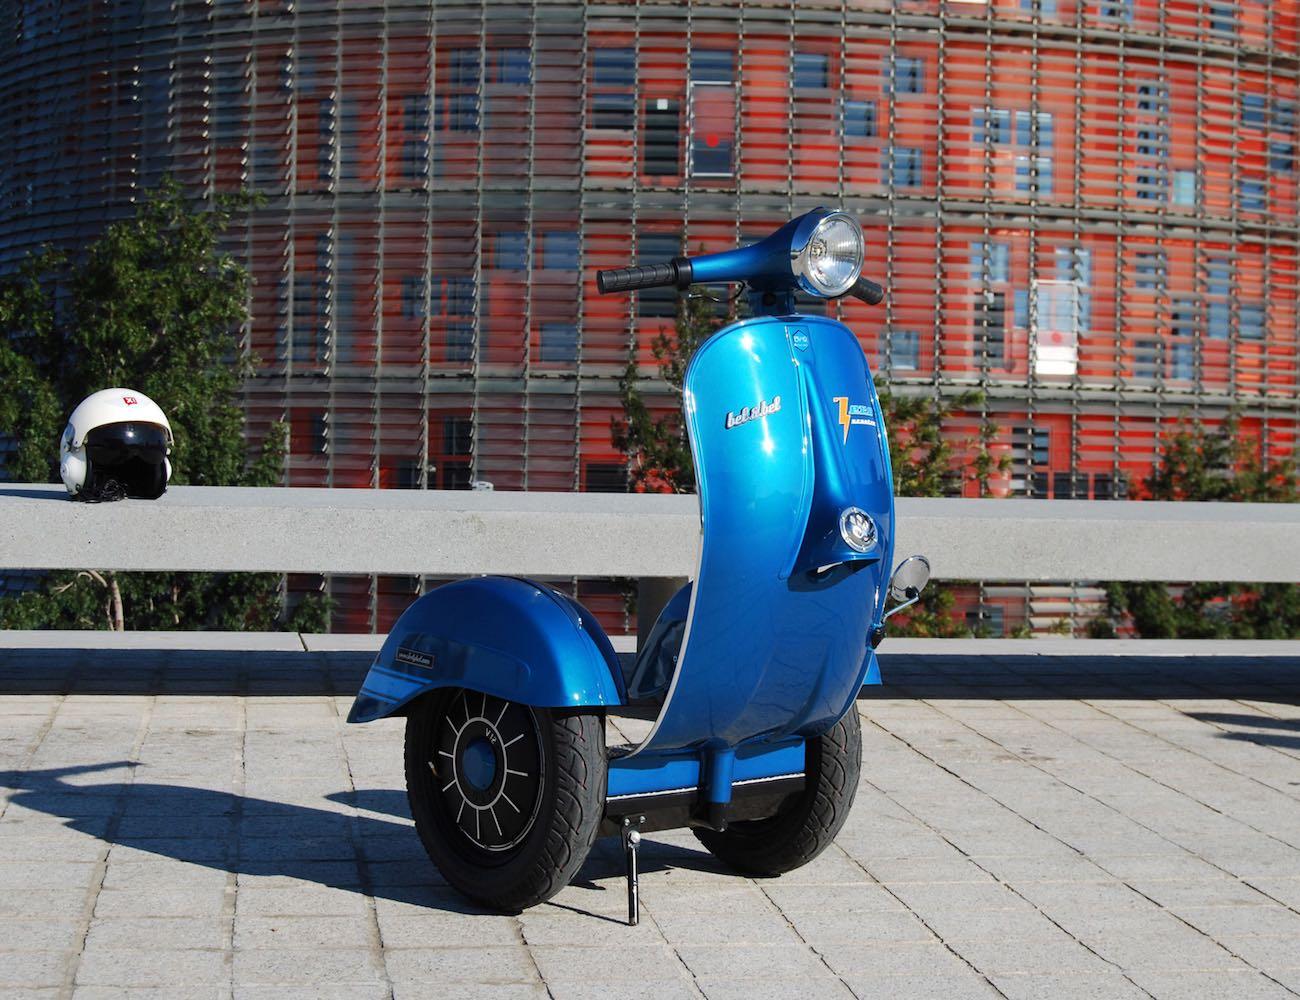 Zero Scooter by Bel&Bel